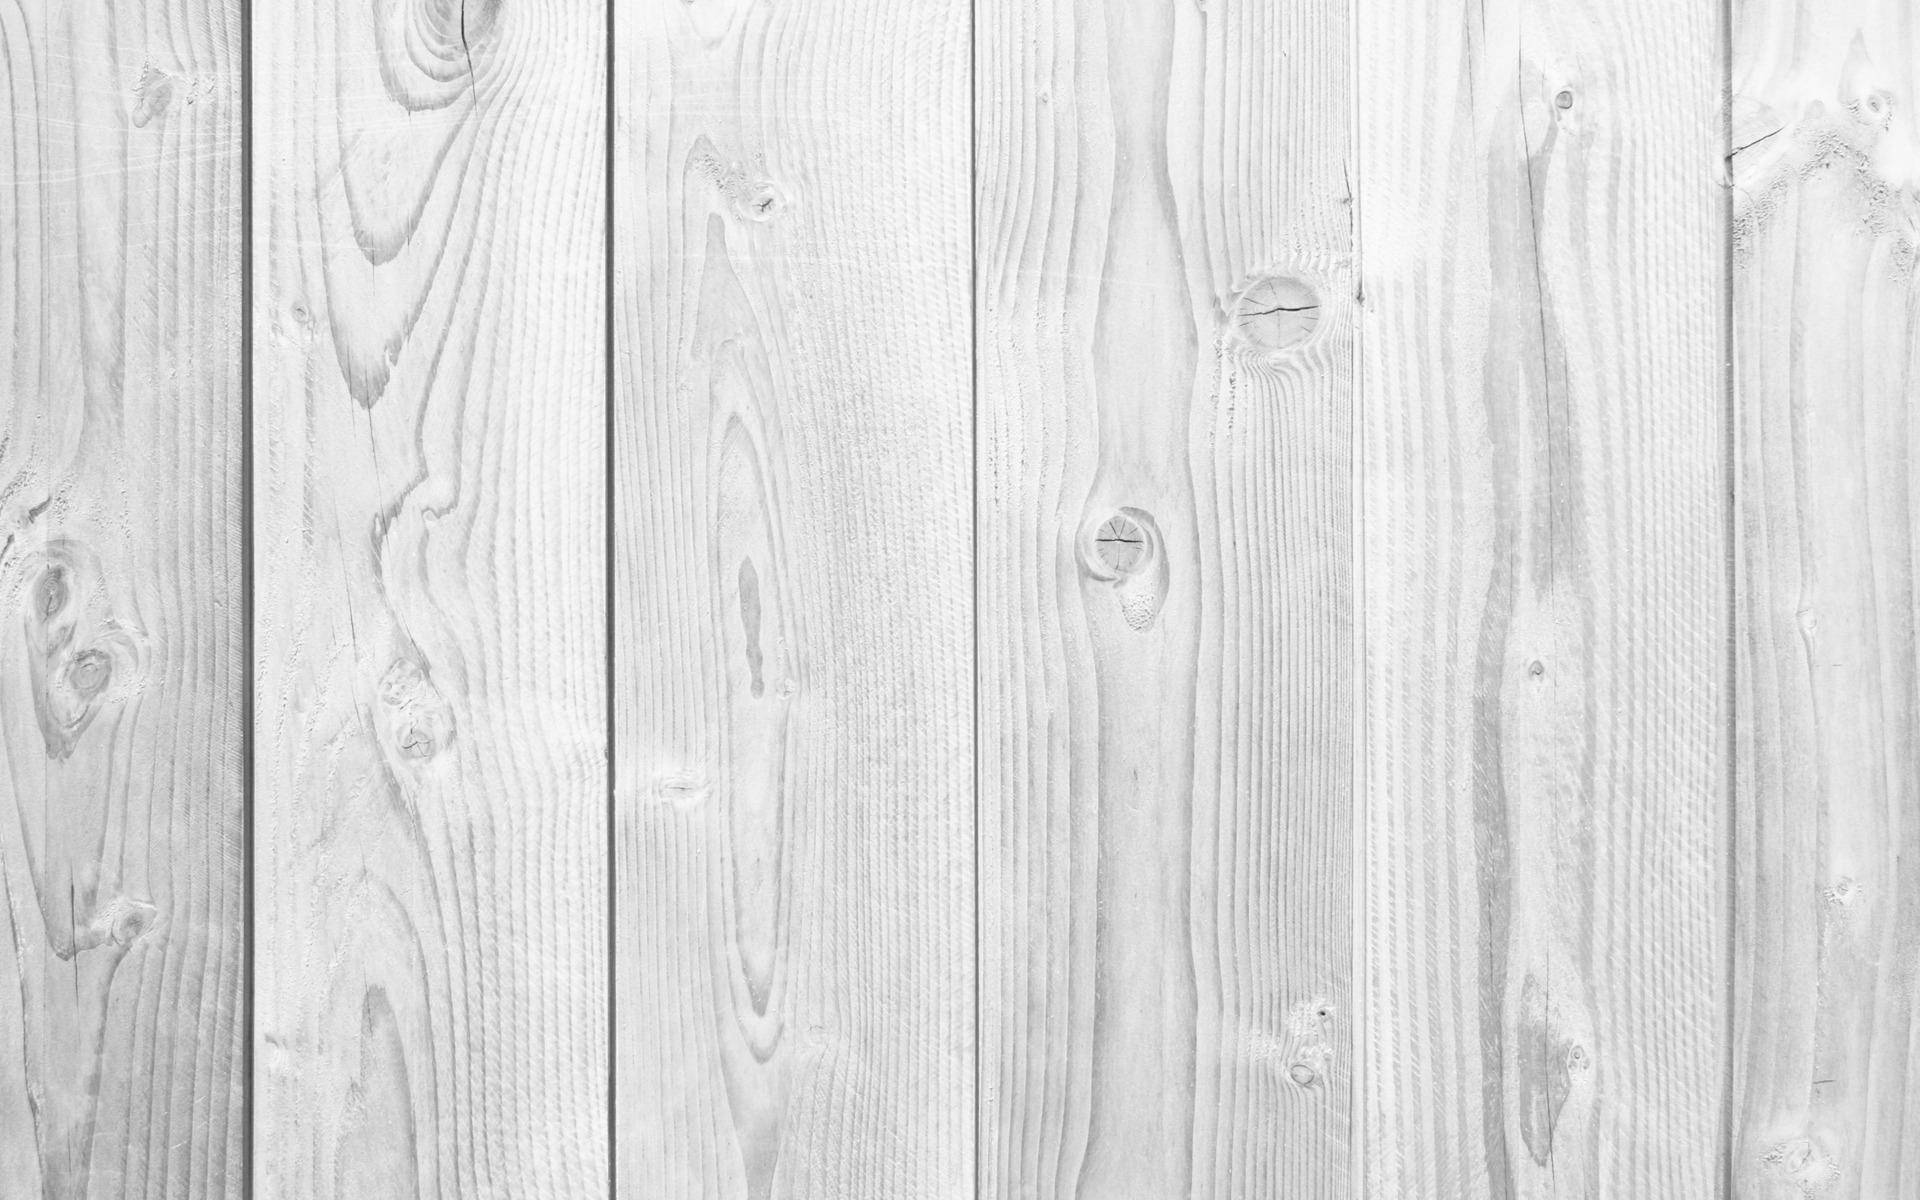 comwp contentuploads201308white wood wall texture wallpaperjpg 1920x1200